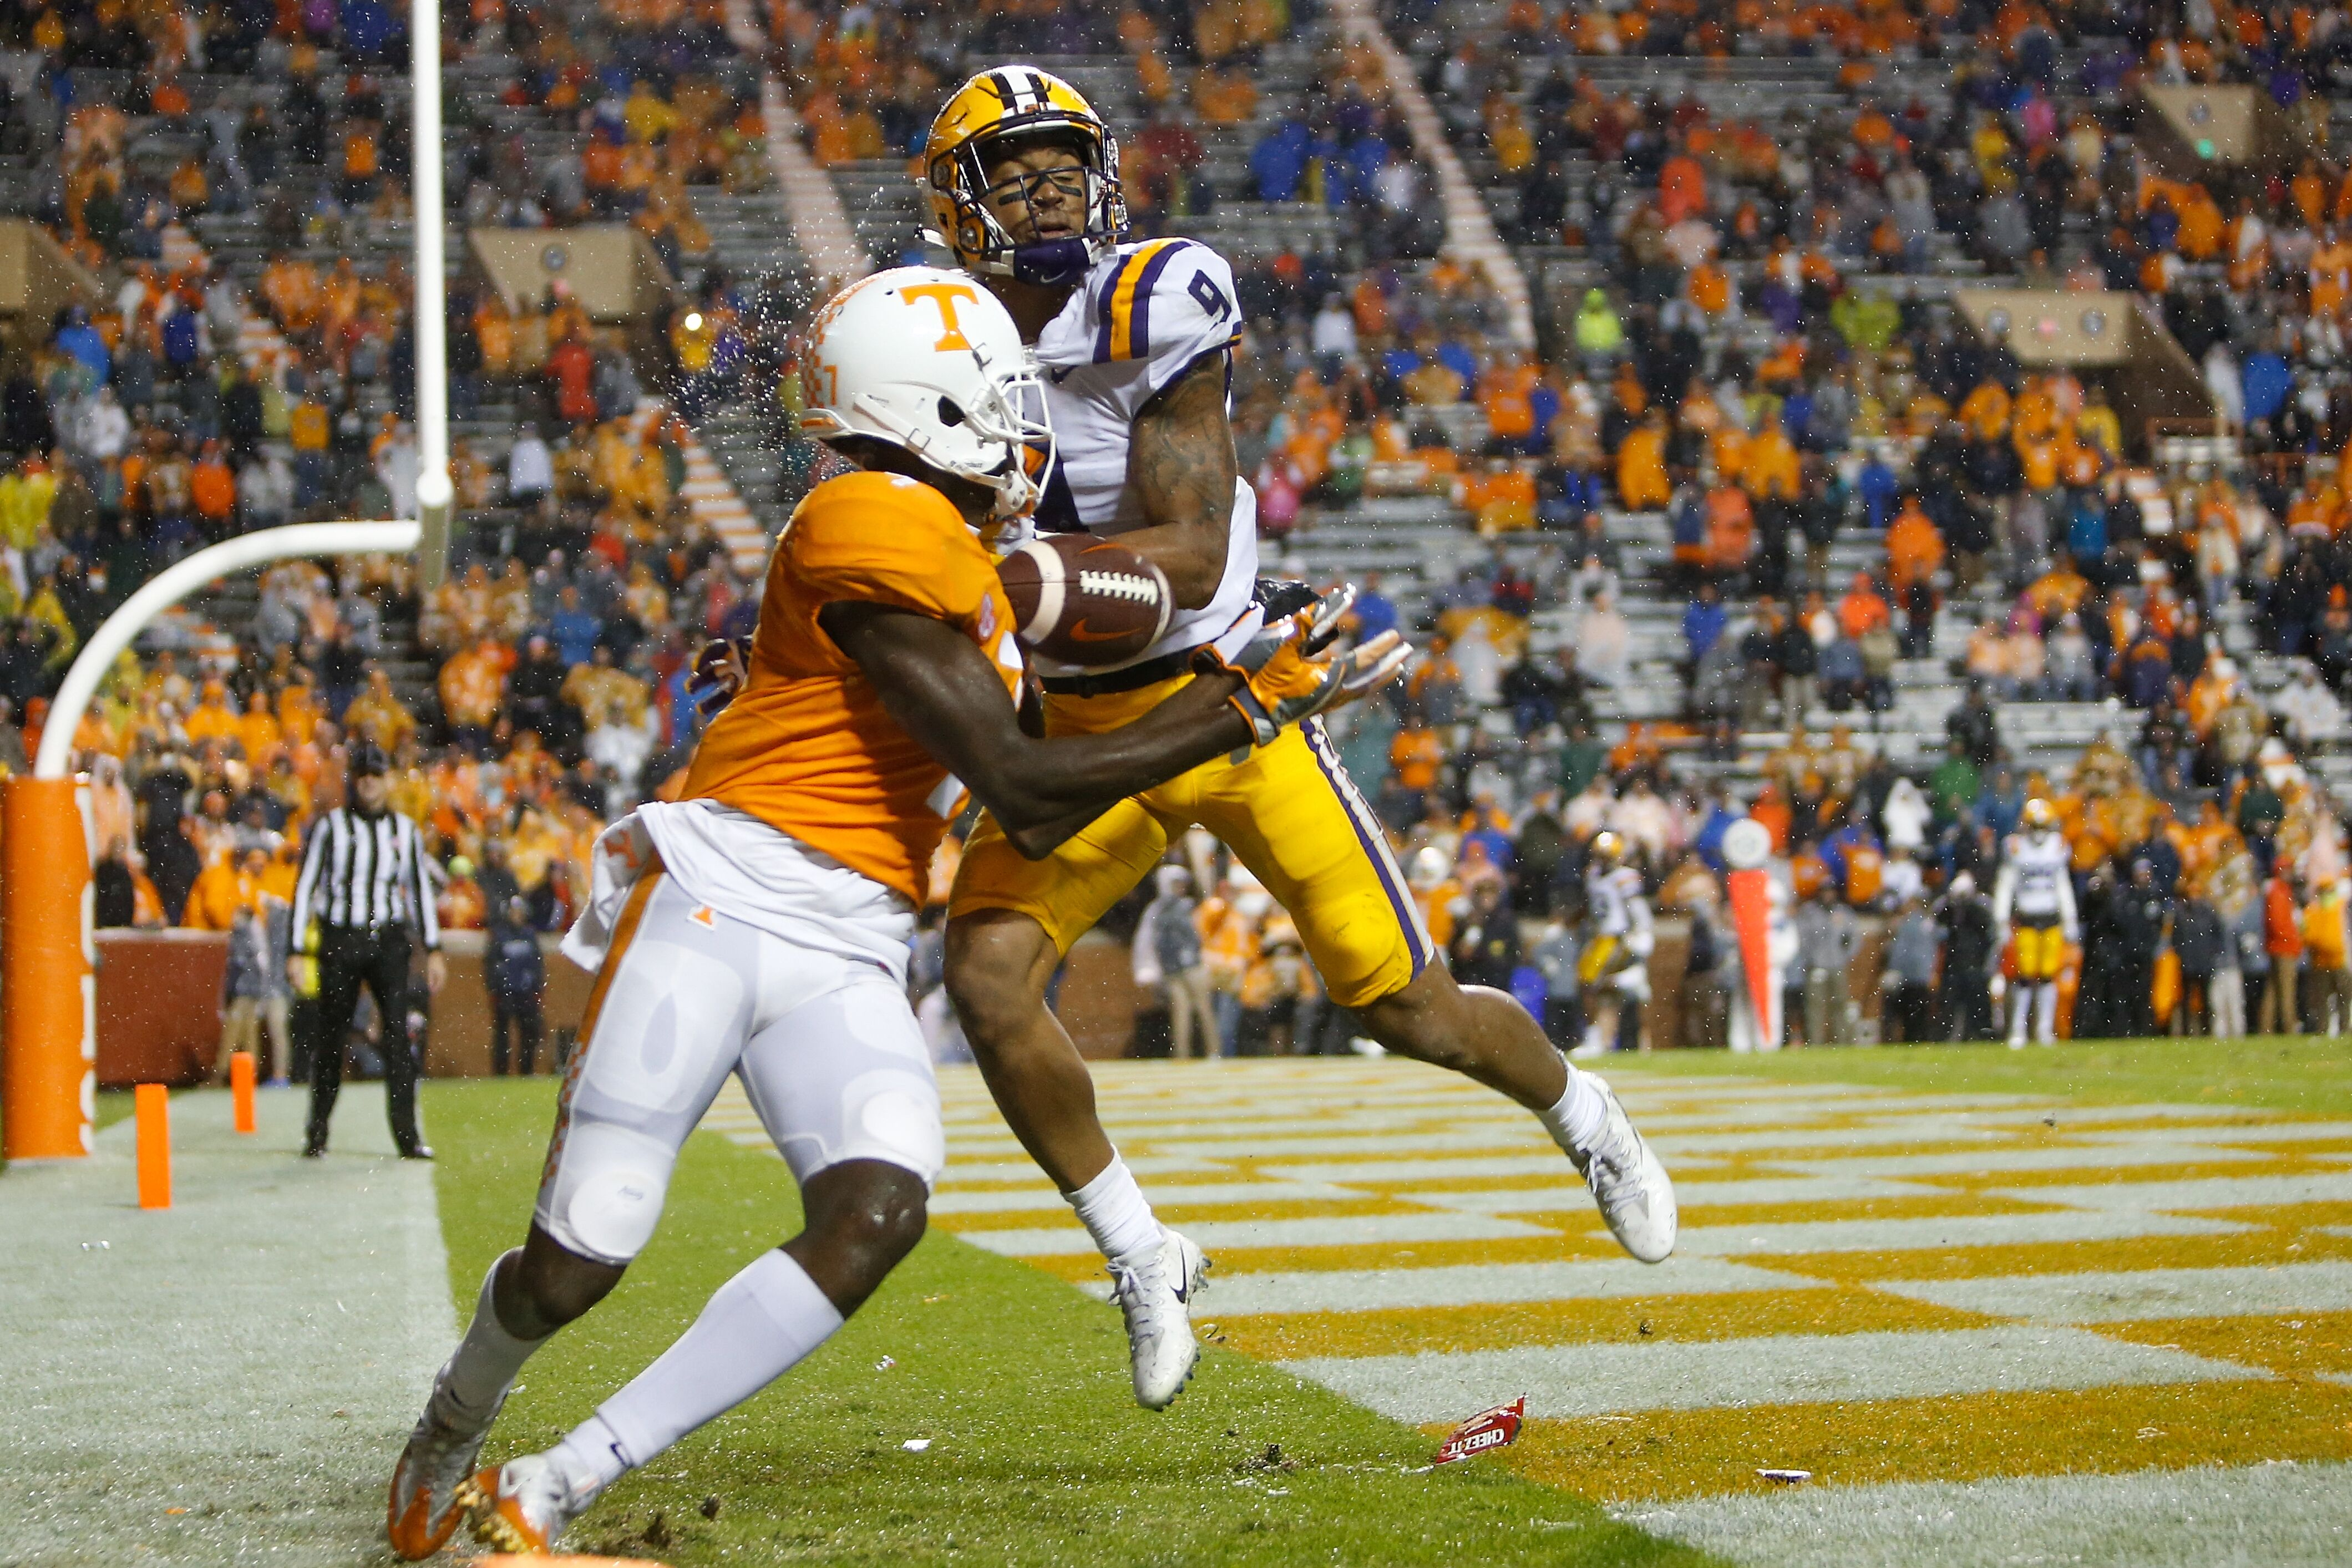 Tennessee football: Brandon Johnson reminds us Vols have